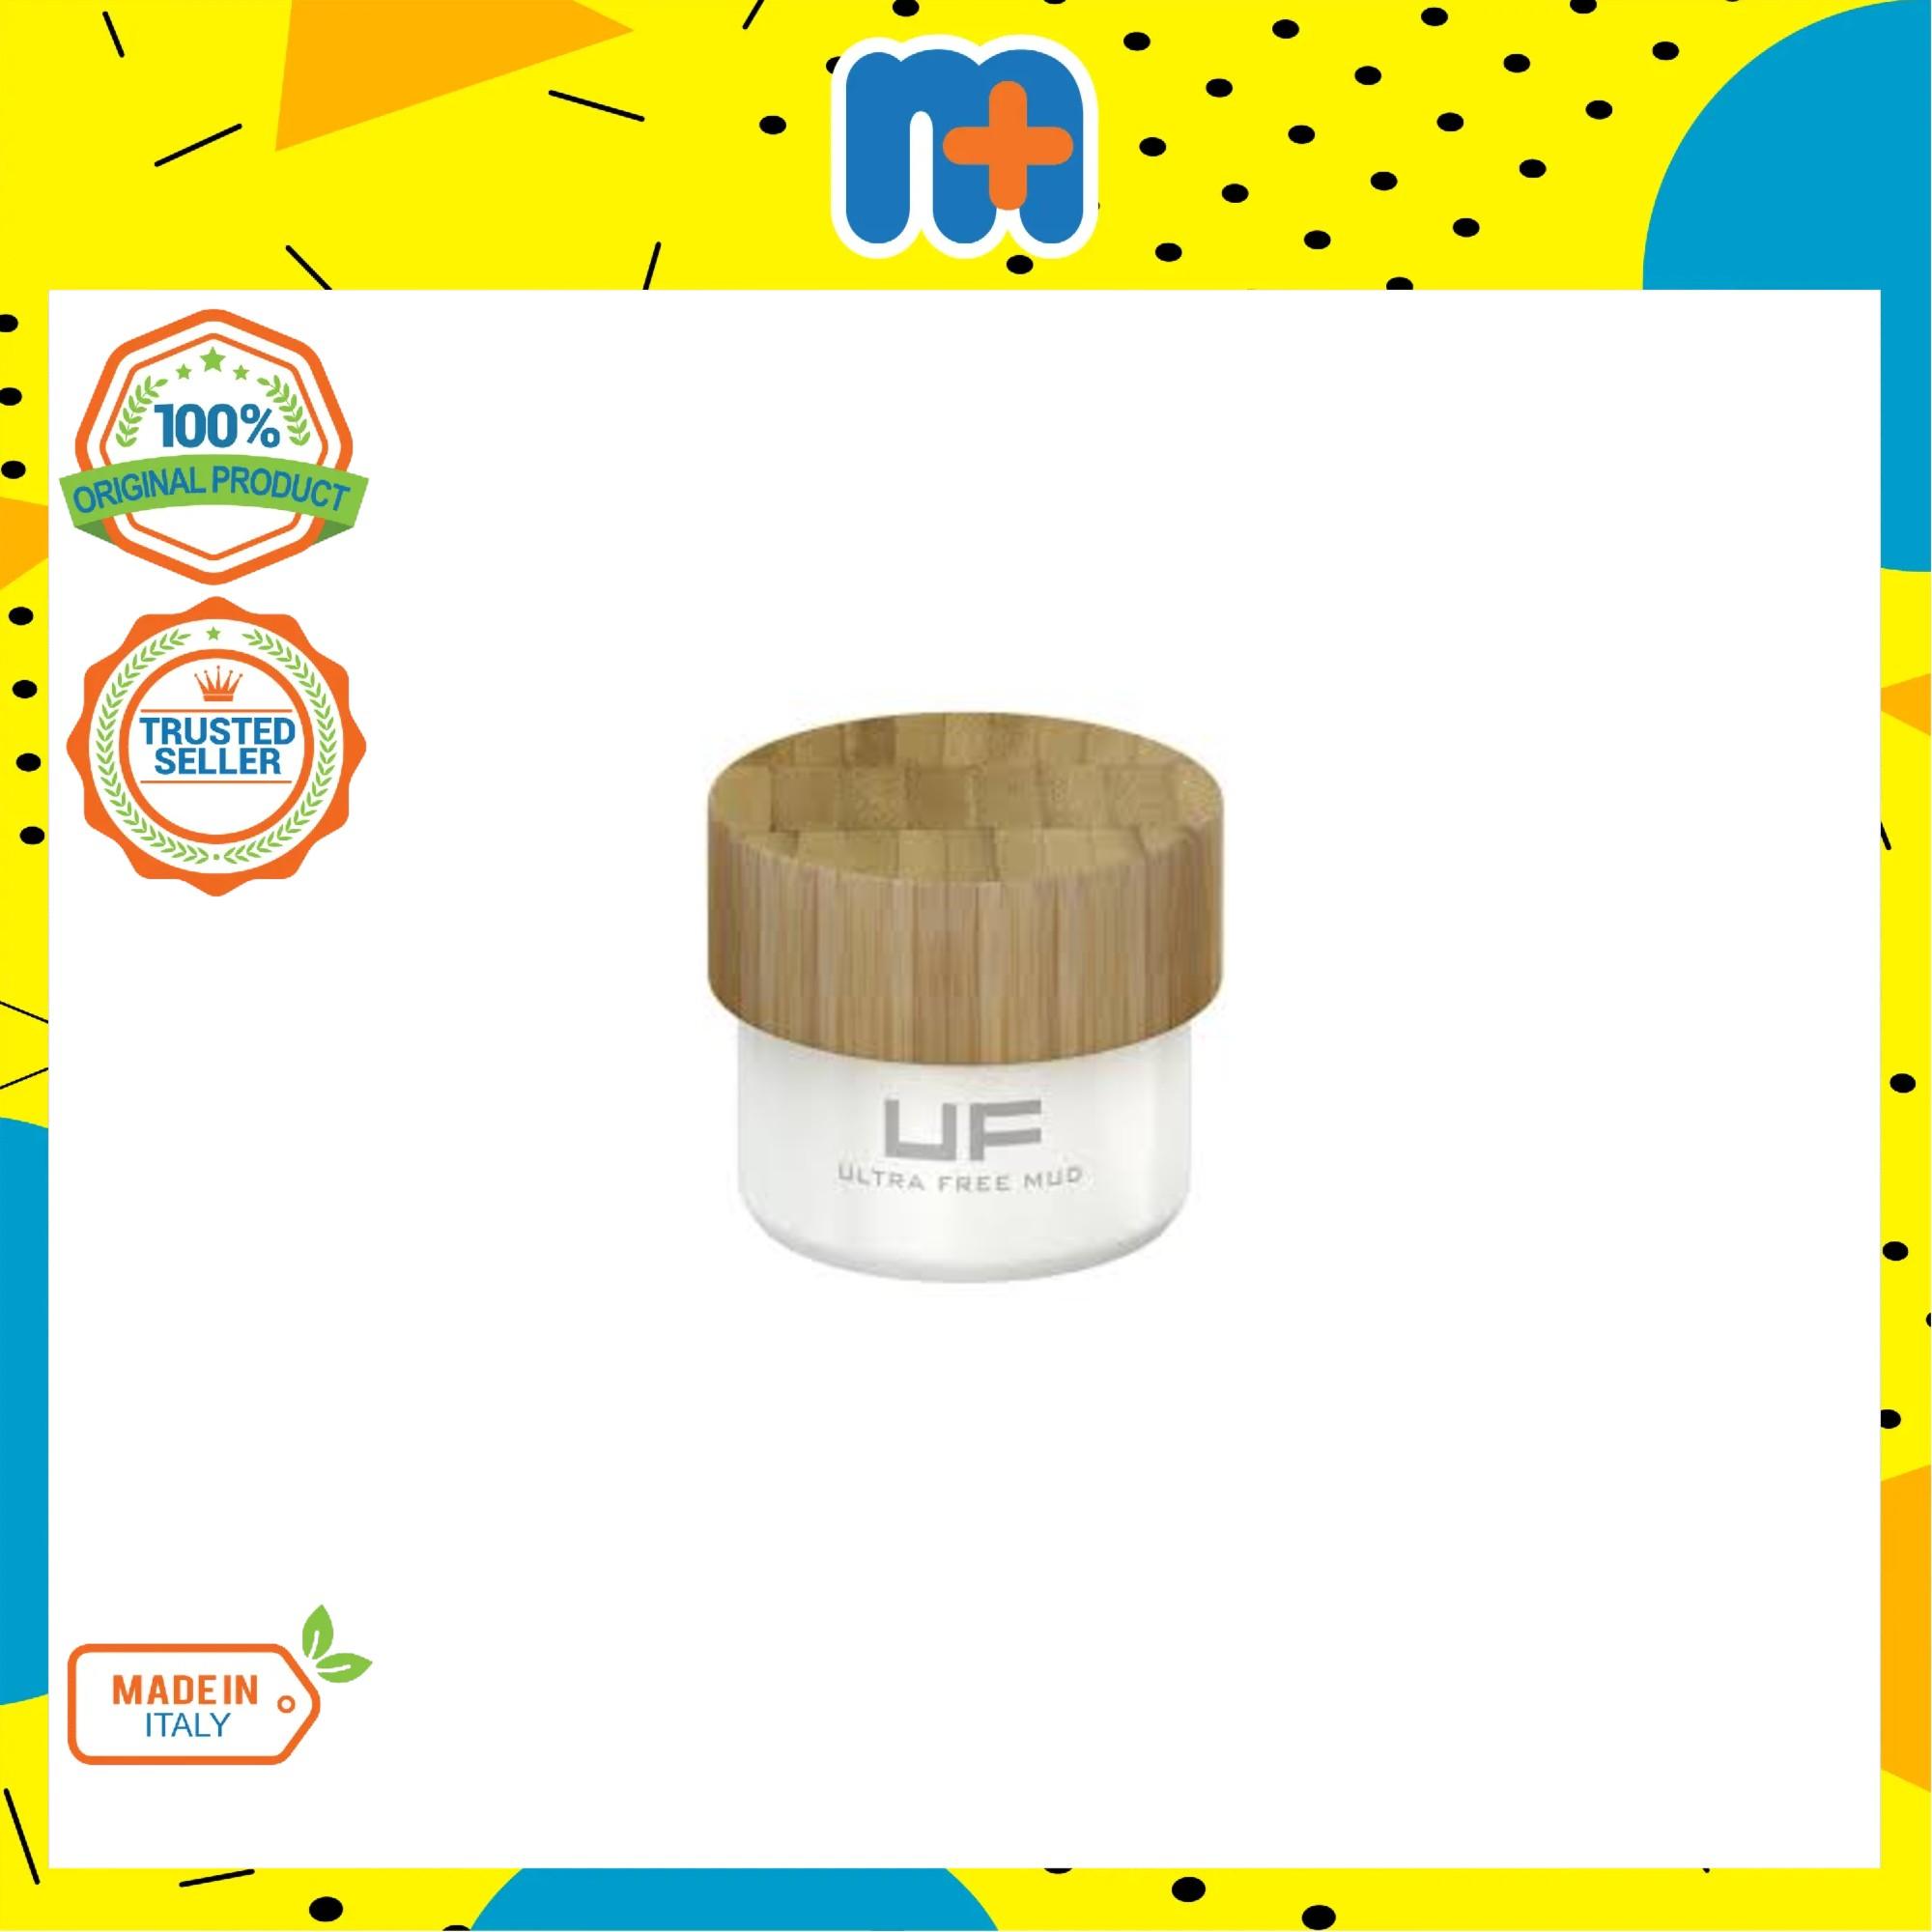 [MPLUS] O\'RIGHT Ultra Free Mud 50ml